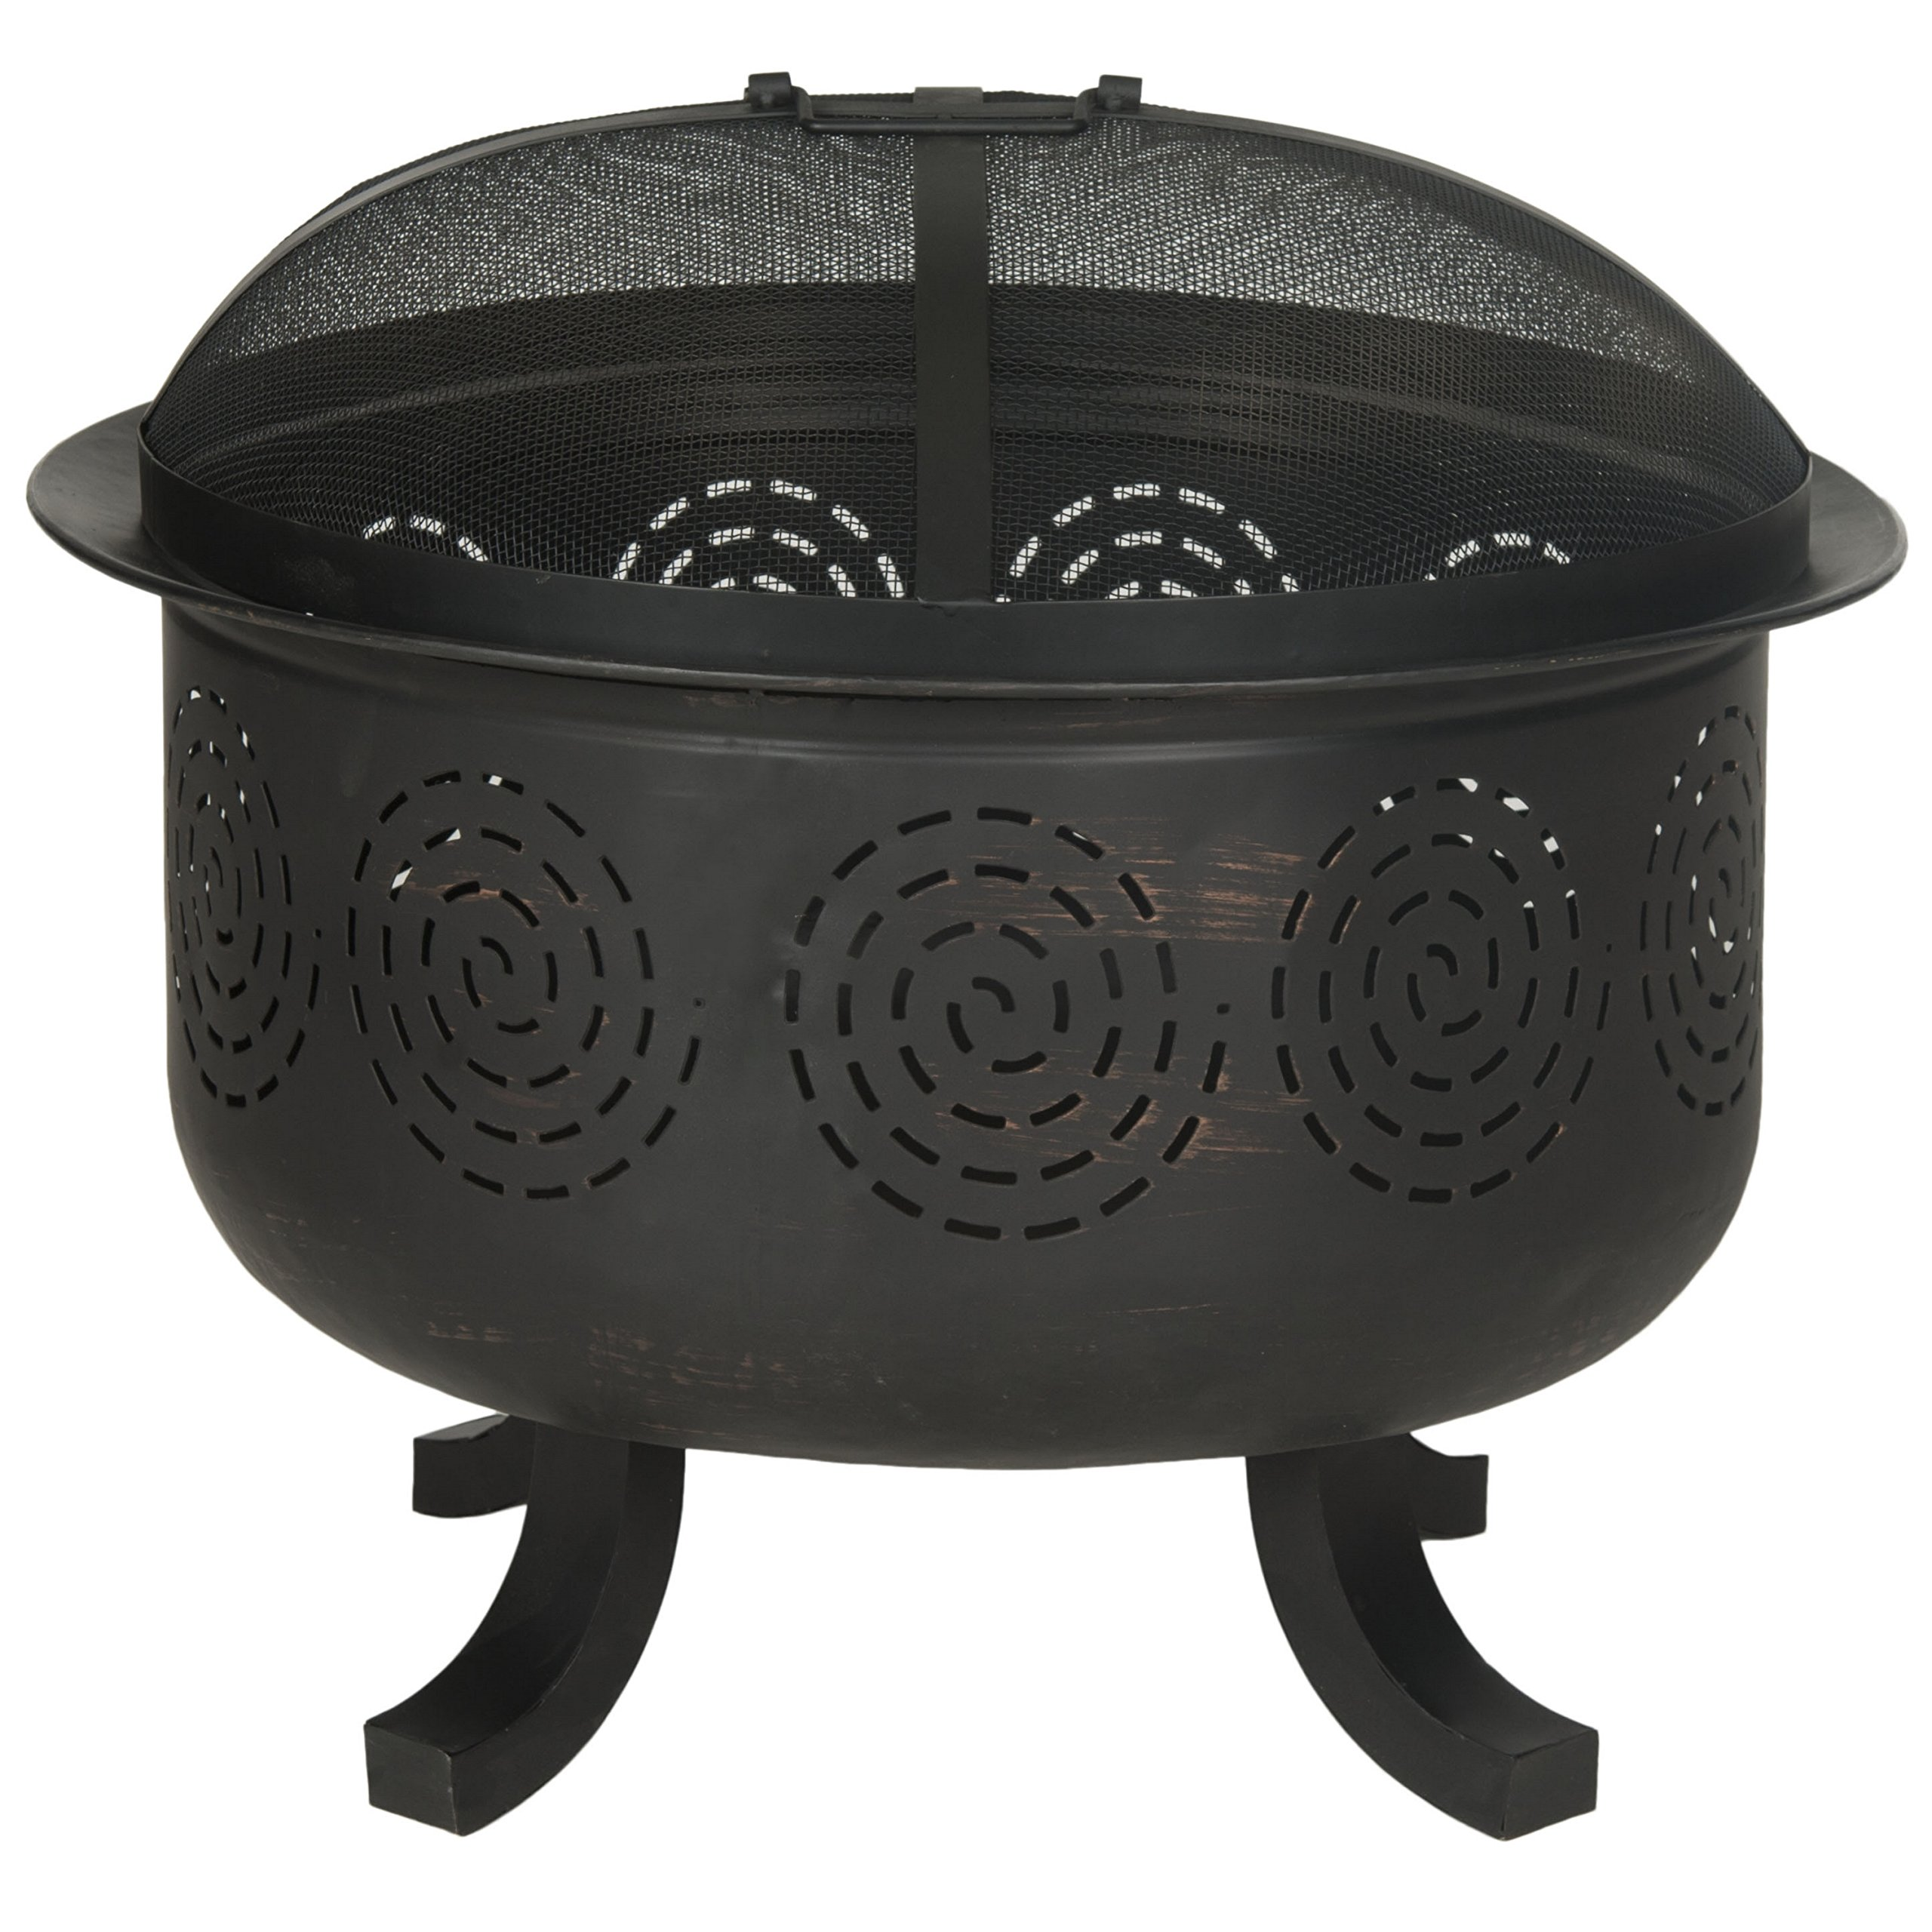 Safavieh Fire Pit, Copper/Black by Safavieh